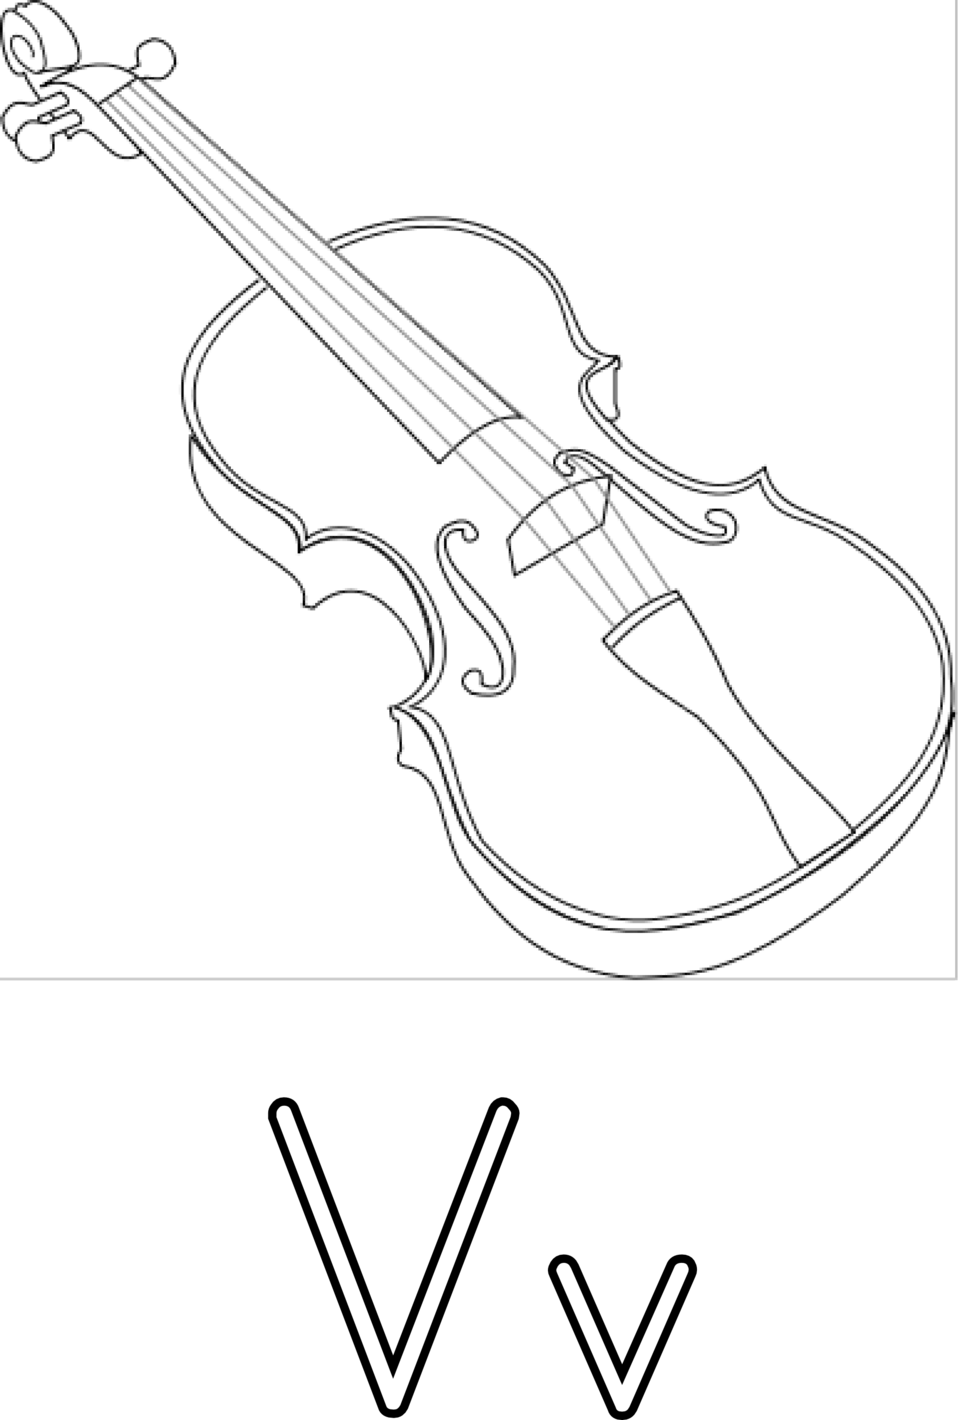 V for violin for coloring